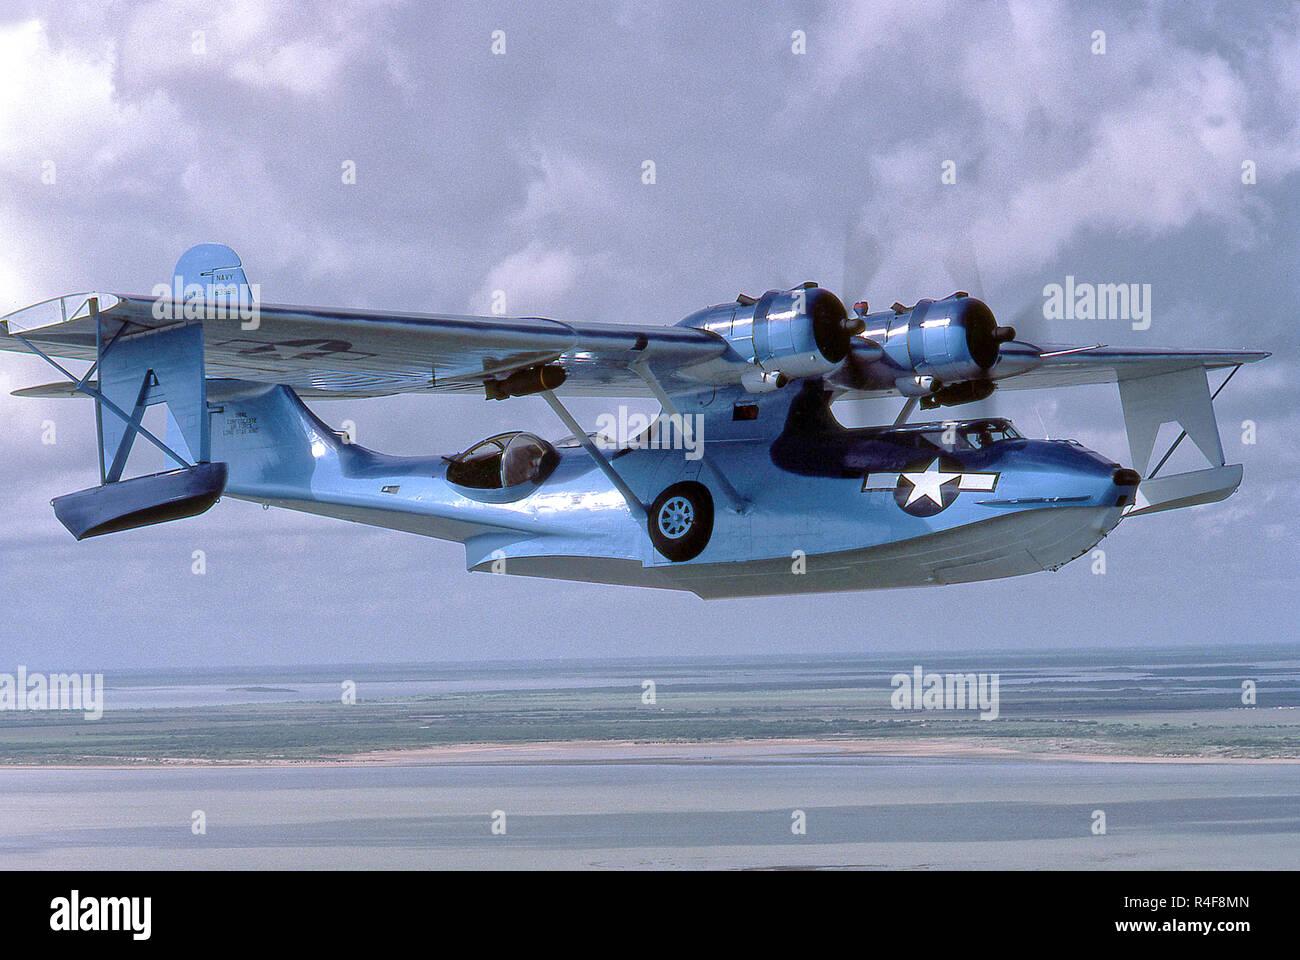 PBY Catalina Flying Boat - Stock Image